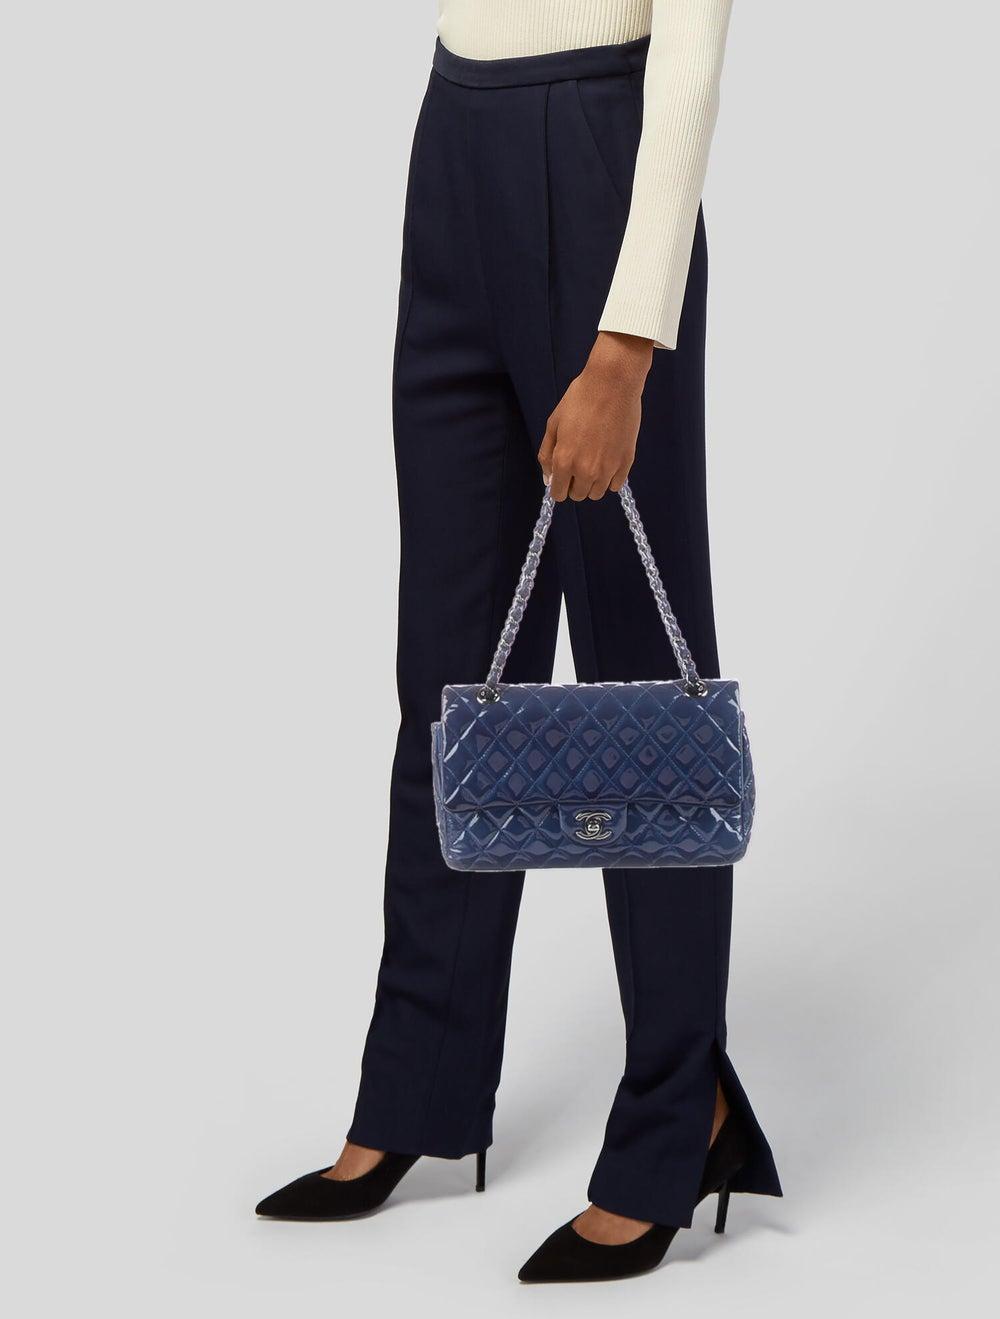 Chanel Medium Patent Flap Bag Blue - image 2